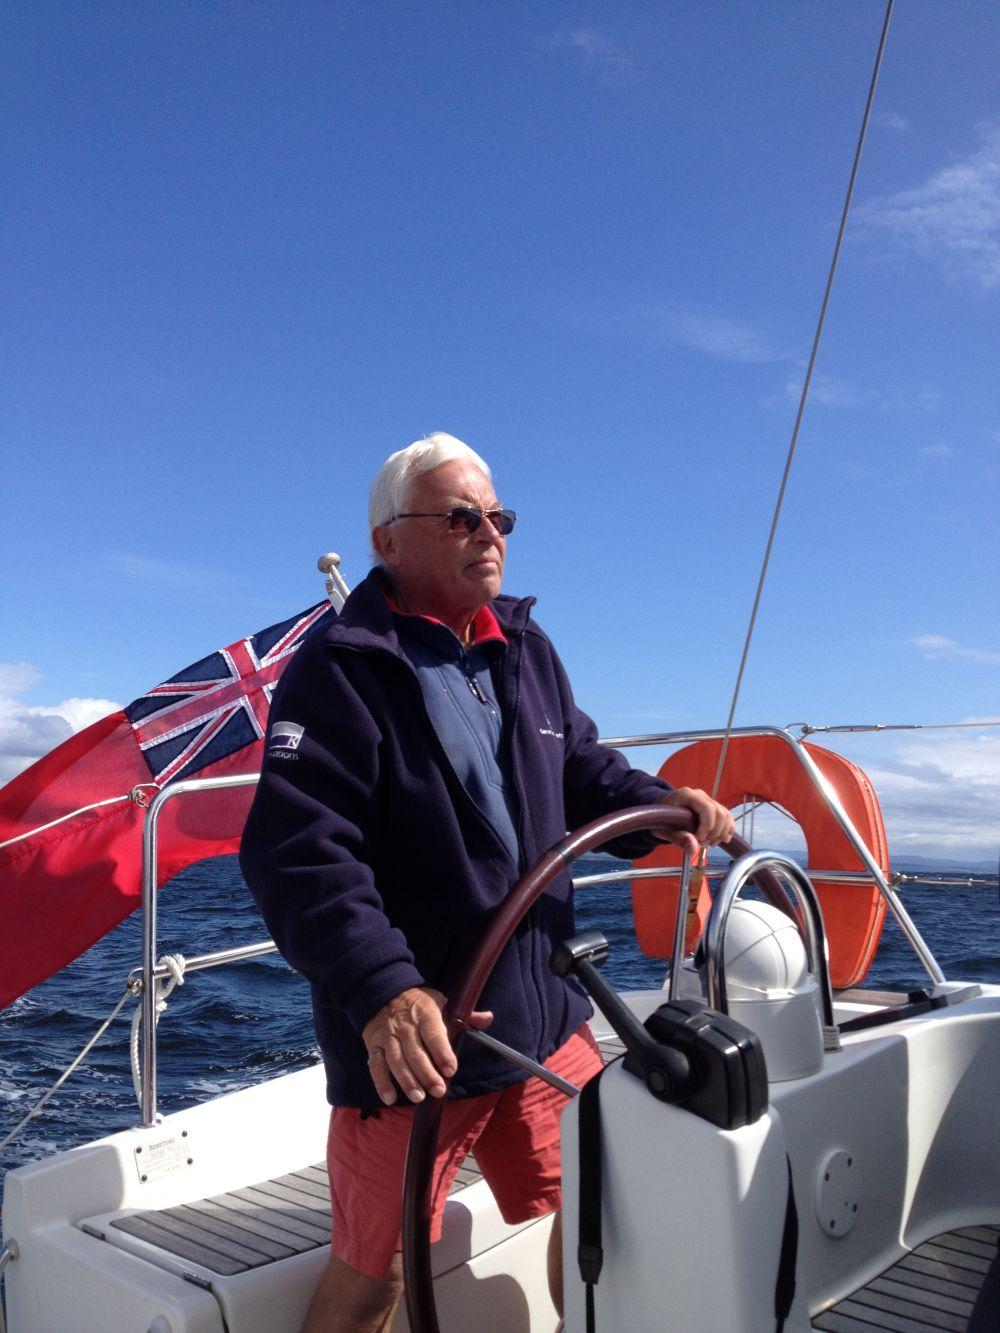 Mr P Senior at the Wheel